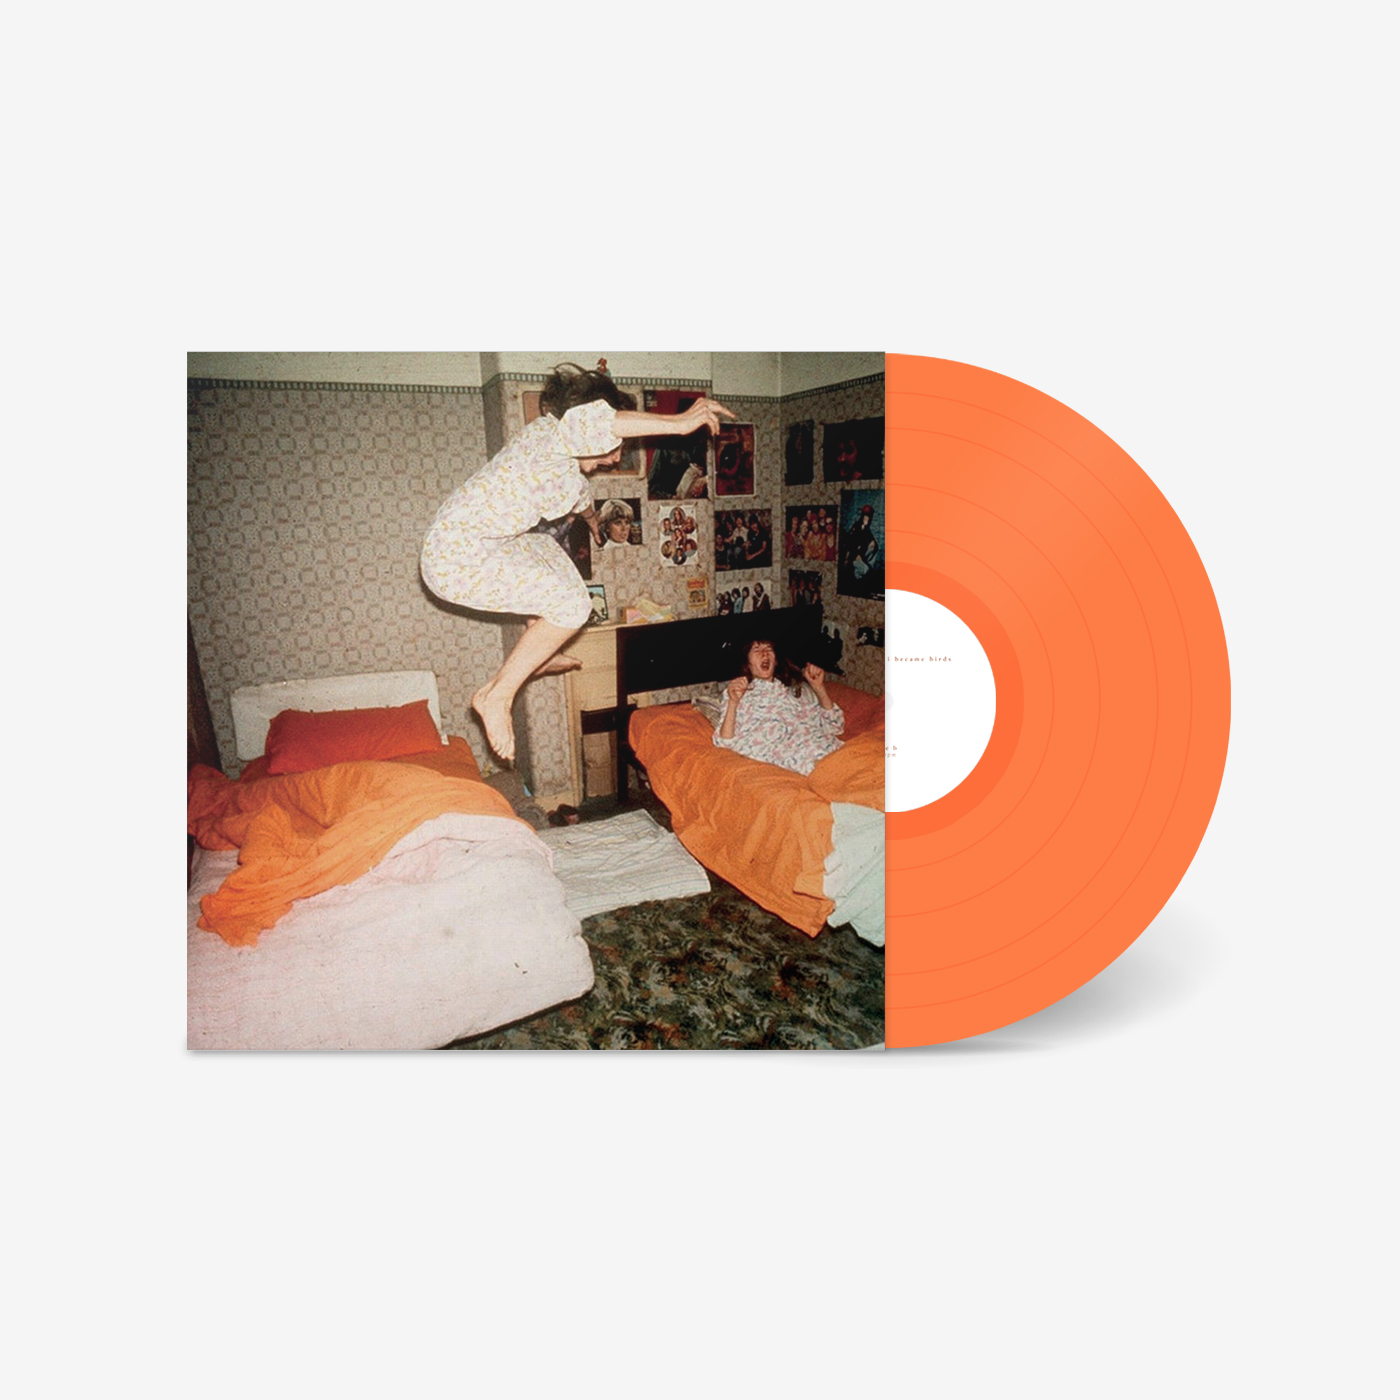 [KPR025] Home Is Where - I Became Birds vinyl